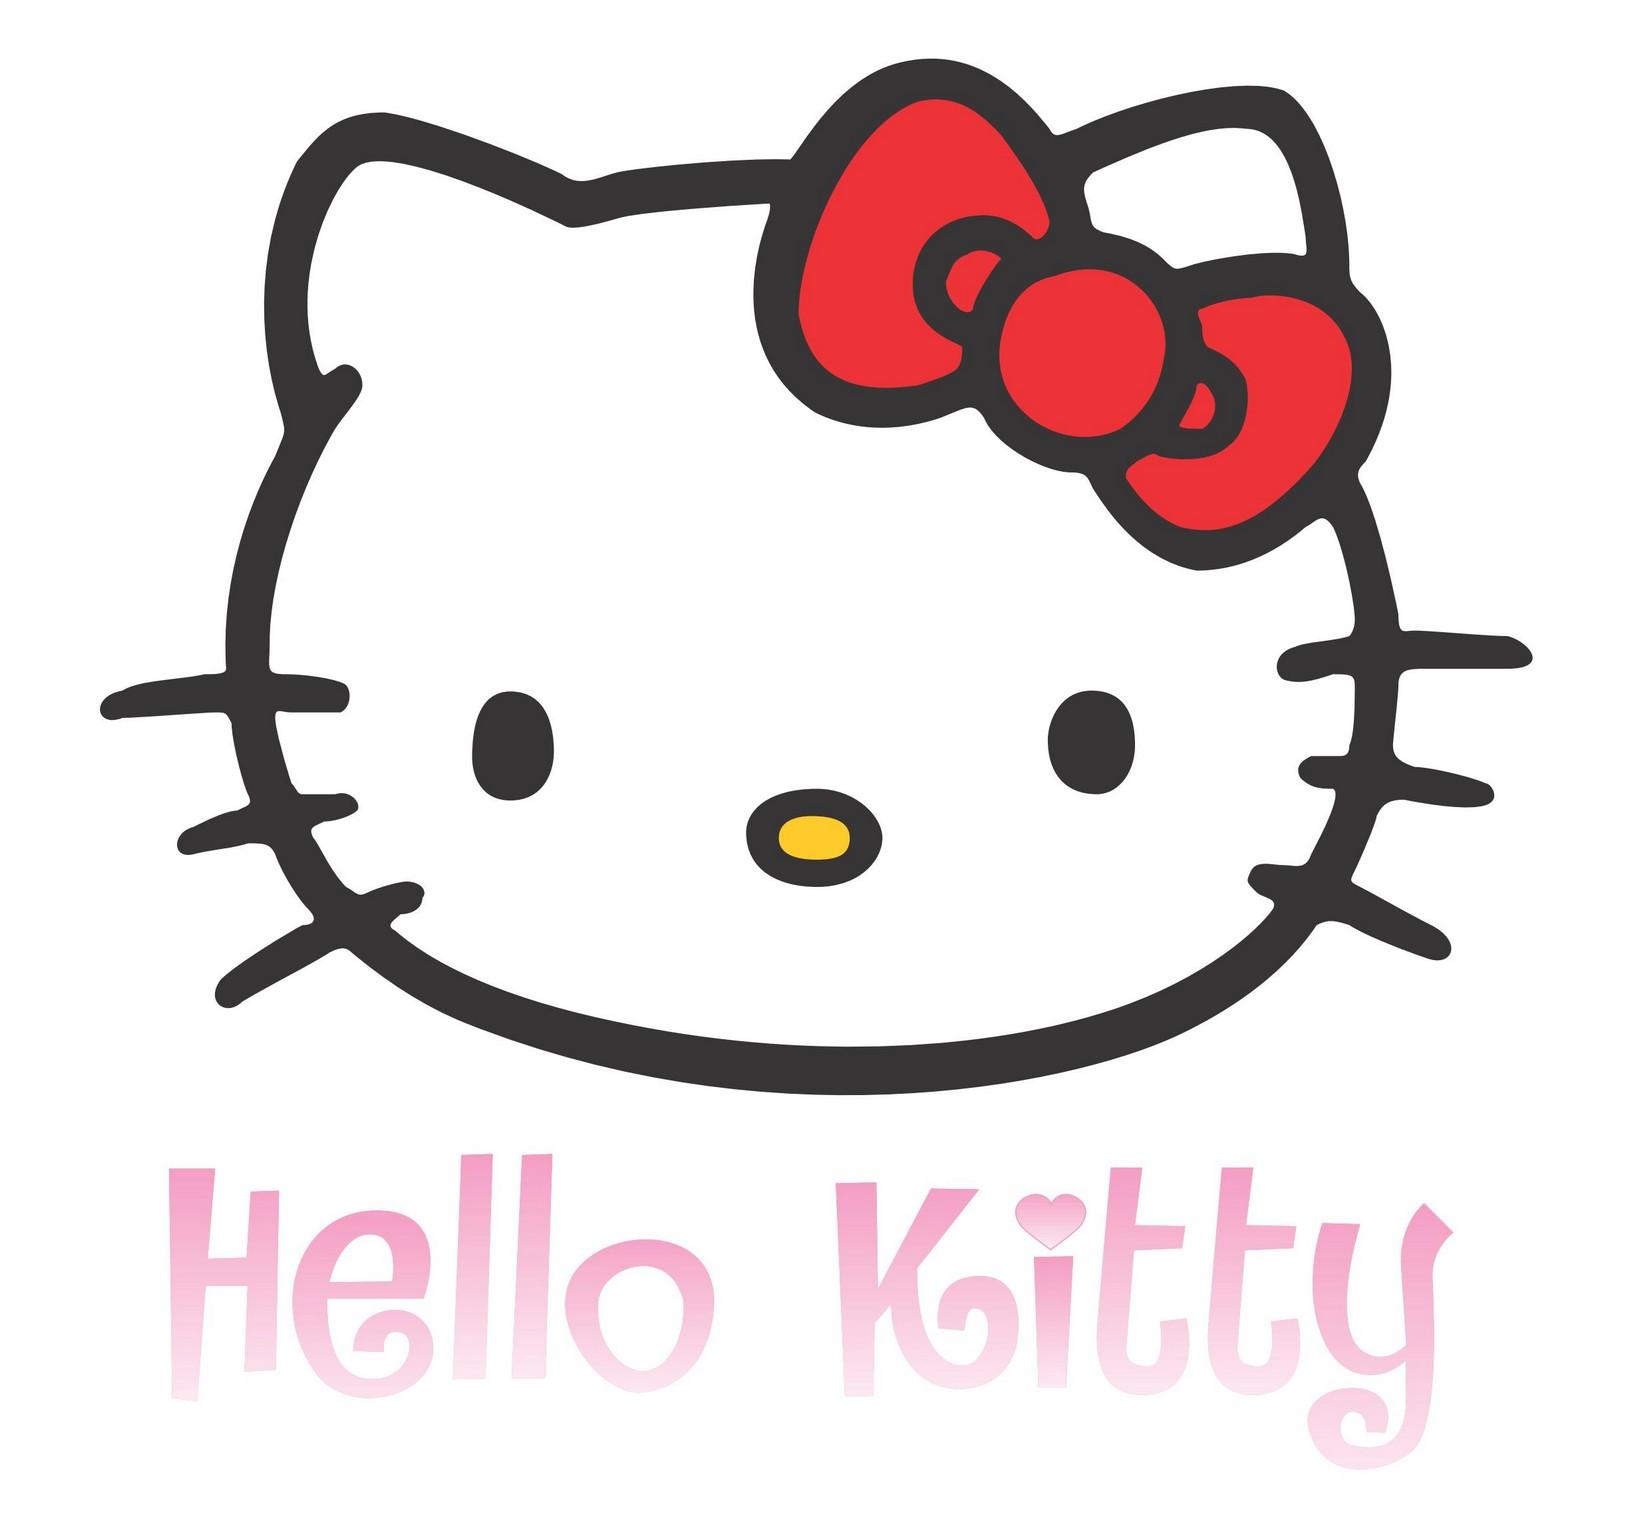 Hello kitty logo Wallpaper